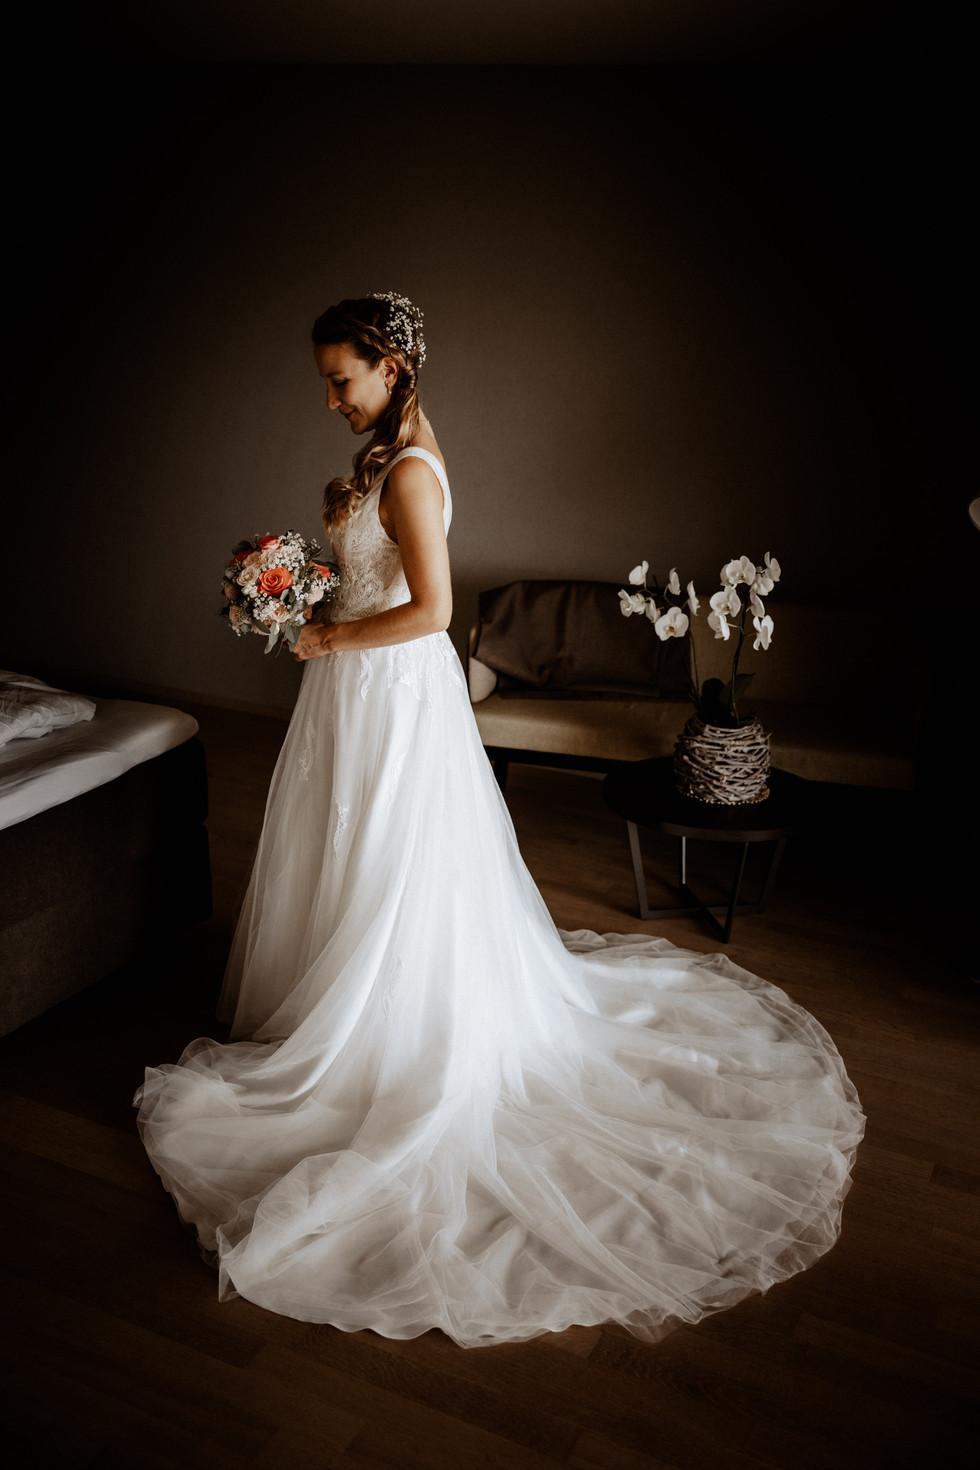 Hochzeitsfotograf Meggen Luzern- getting ready- golfhotel meggen.jpg